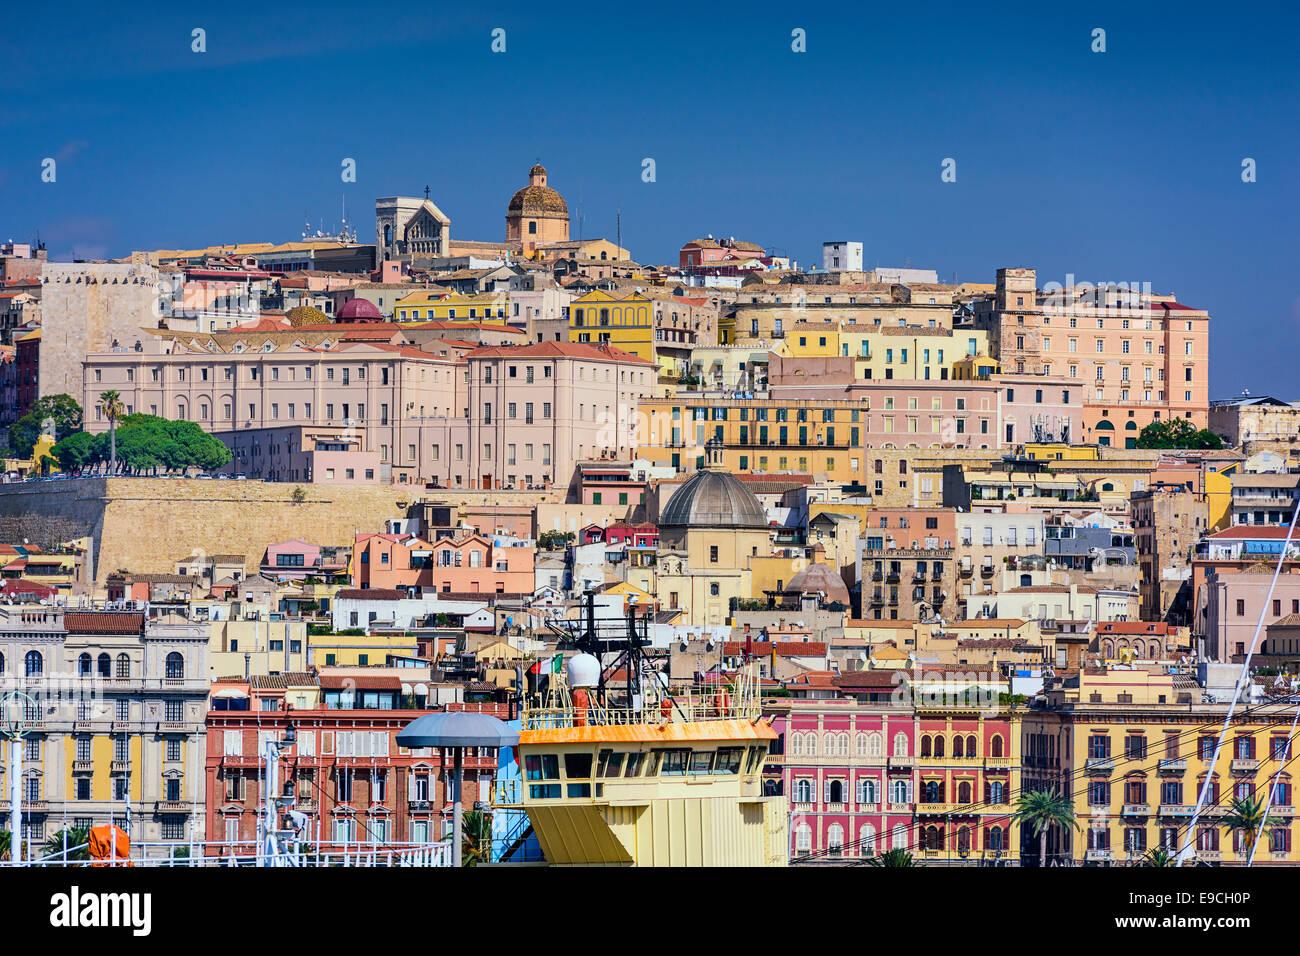 Cagliari, Sardaigne, Italie paysage urbain. Photo Stock